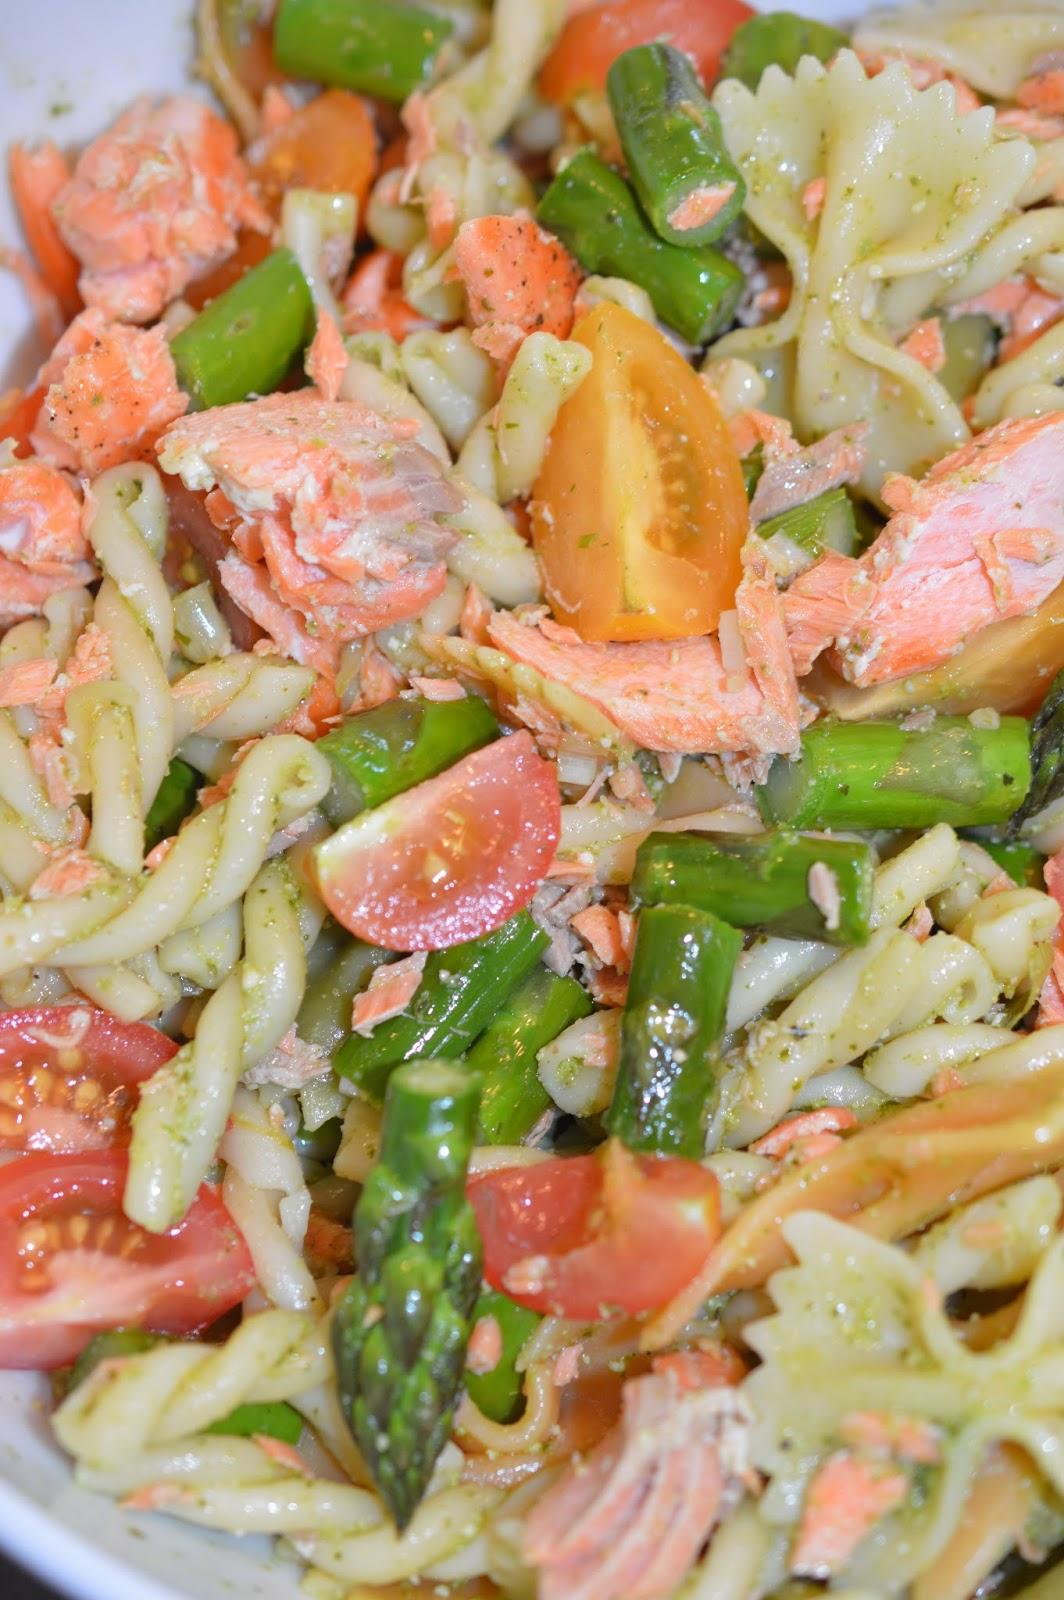 Lili popotte: Salade de pâtes au saumon, aux asperges et au pesto - Salade Pates Pesto